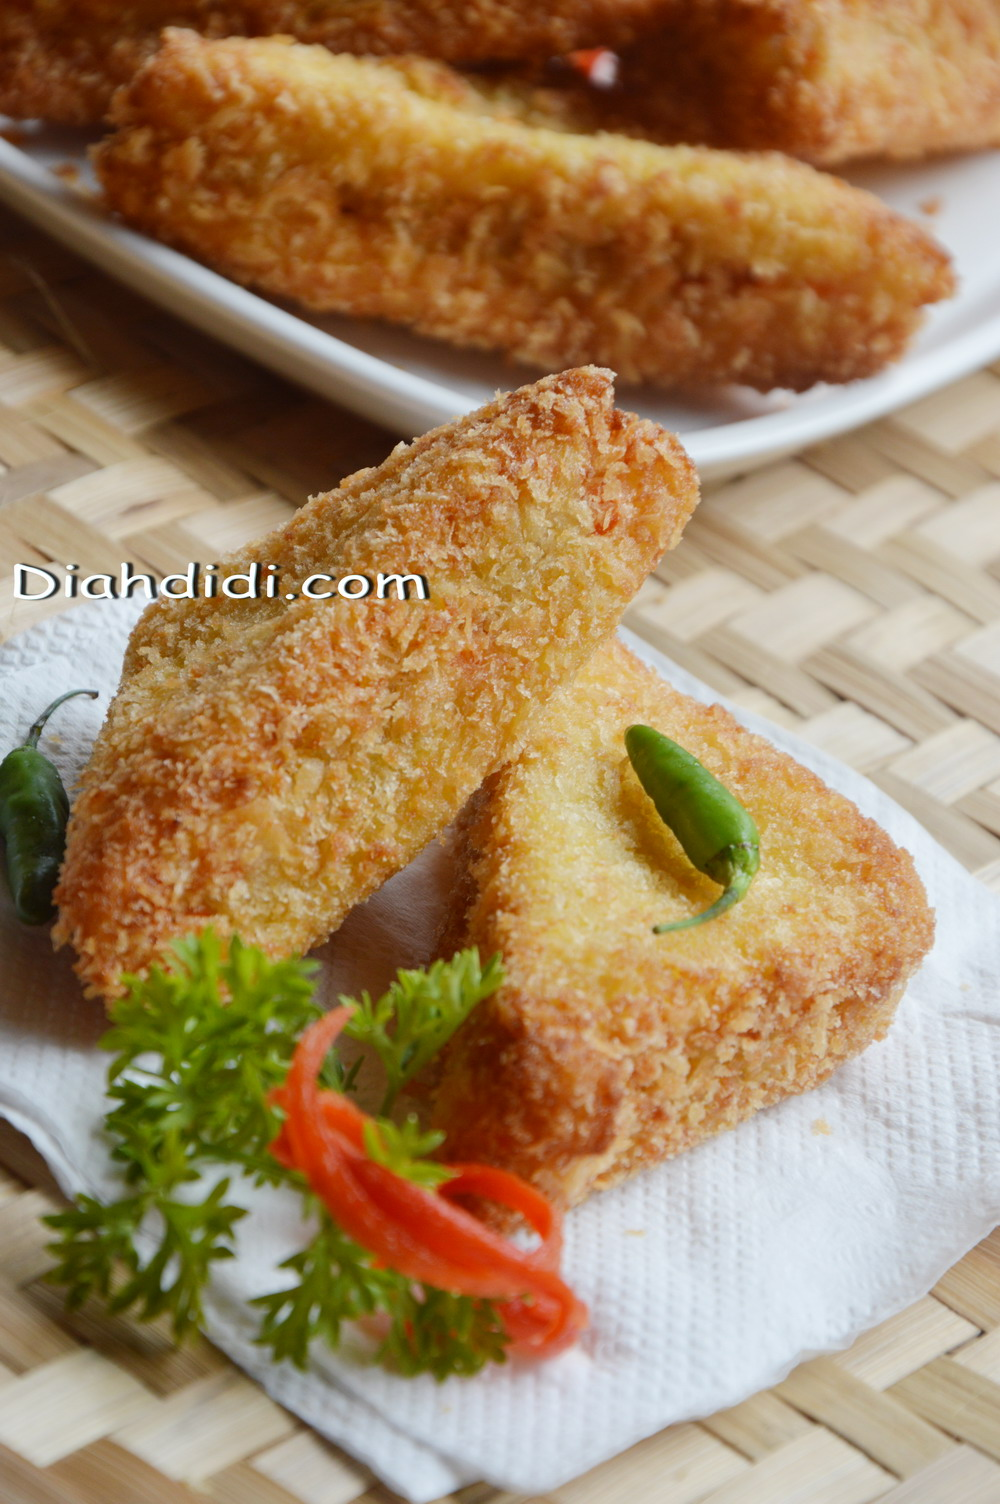 Diah Didis Kitchen Memanfaatkan Stock Roti Tawar Menjadi Snack Gandum 400 Gr Enakroti Goreng Isi Ragout